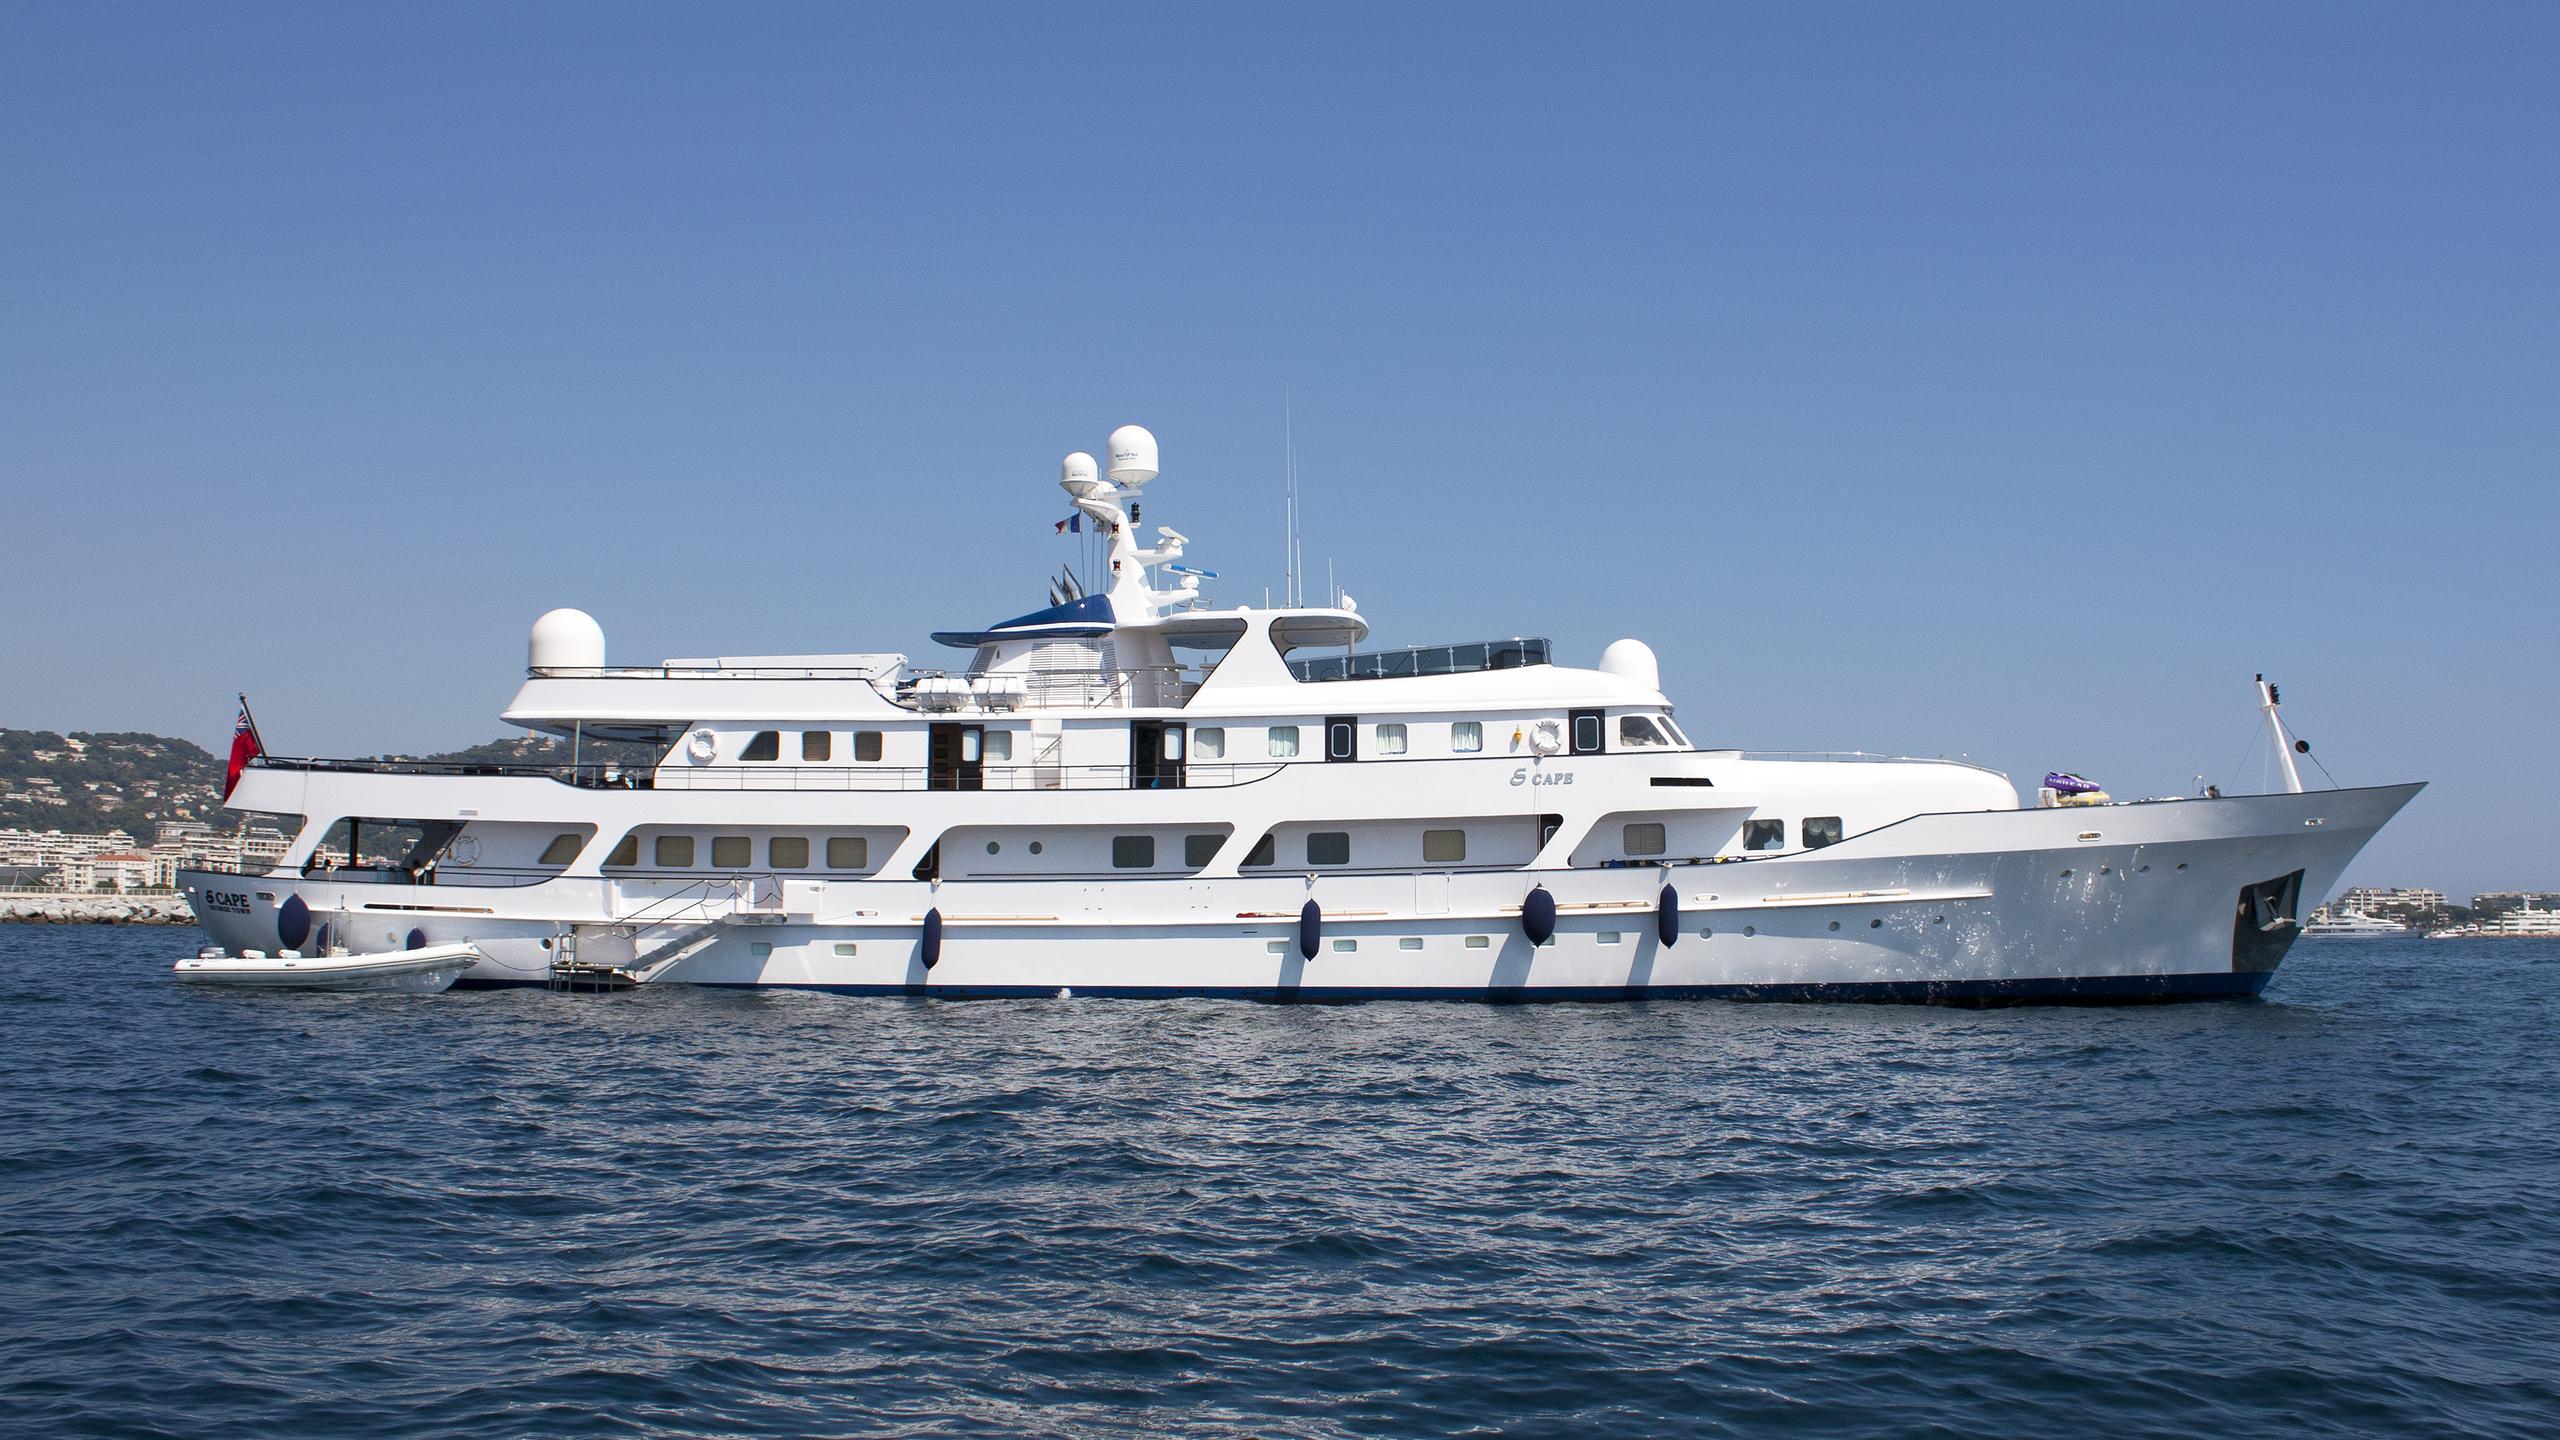 meserret-ii-motor-yacht-cammenga-1978-57m-profile